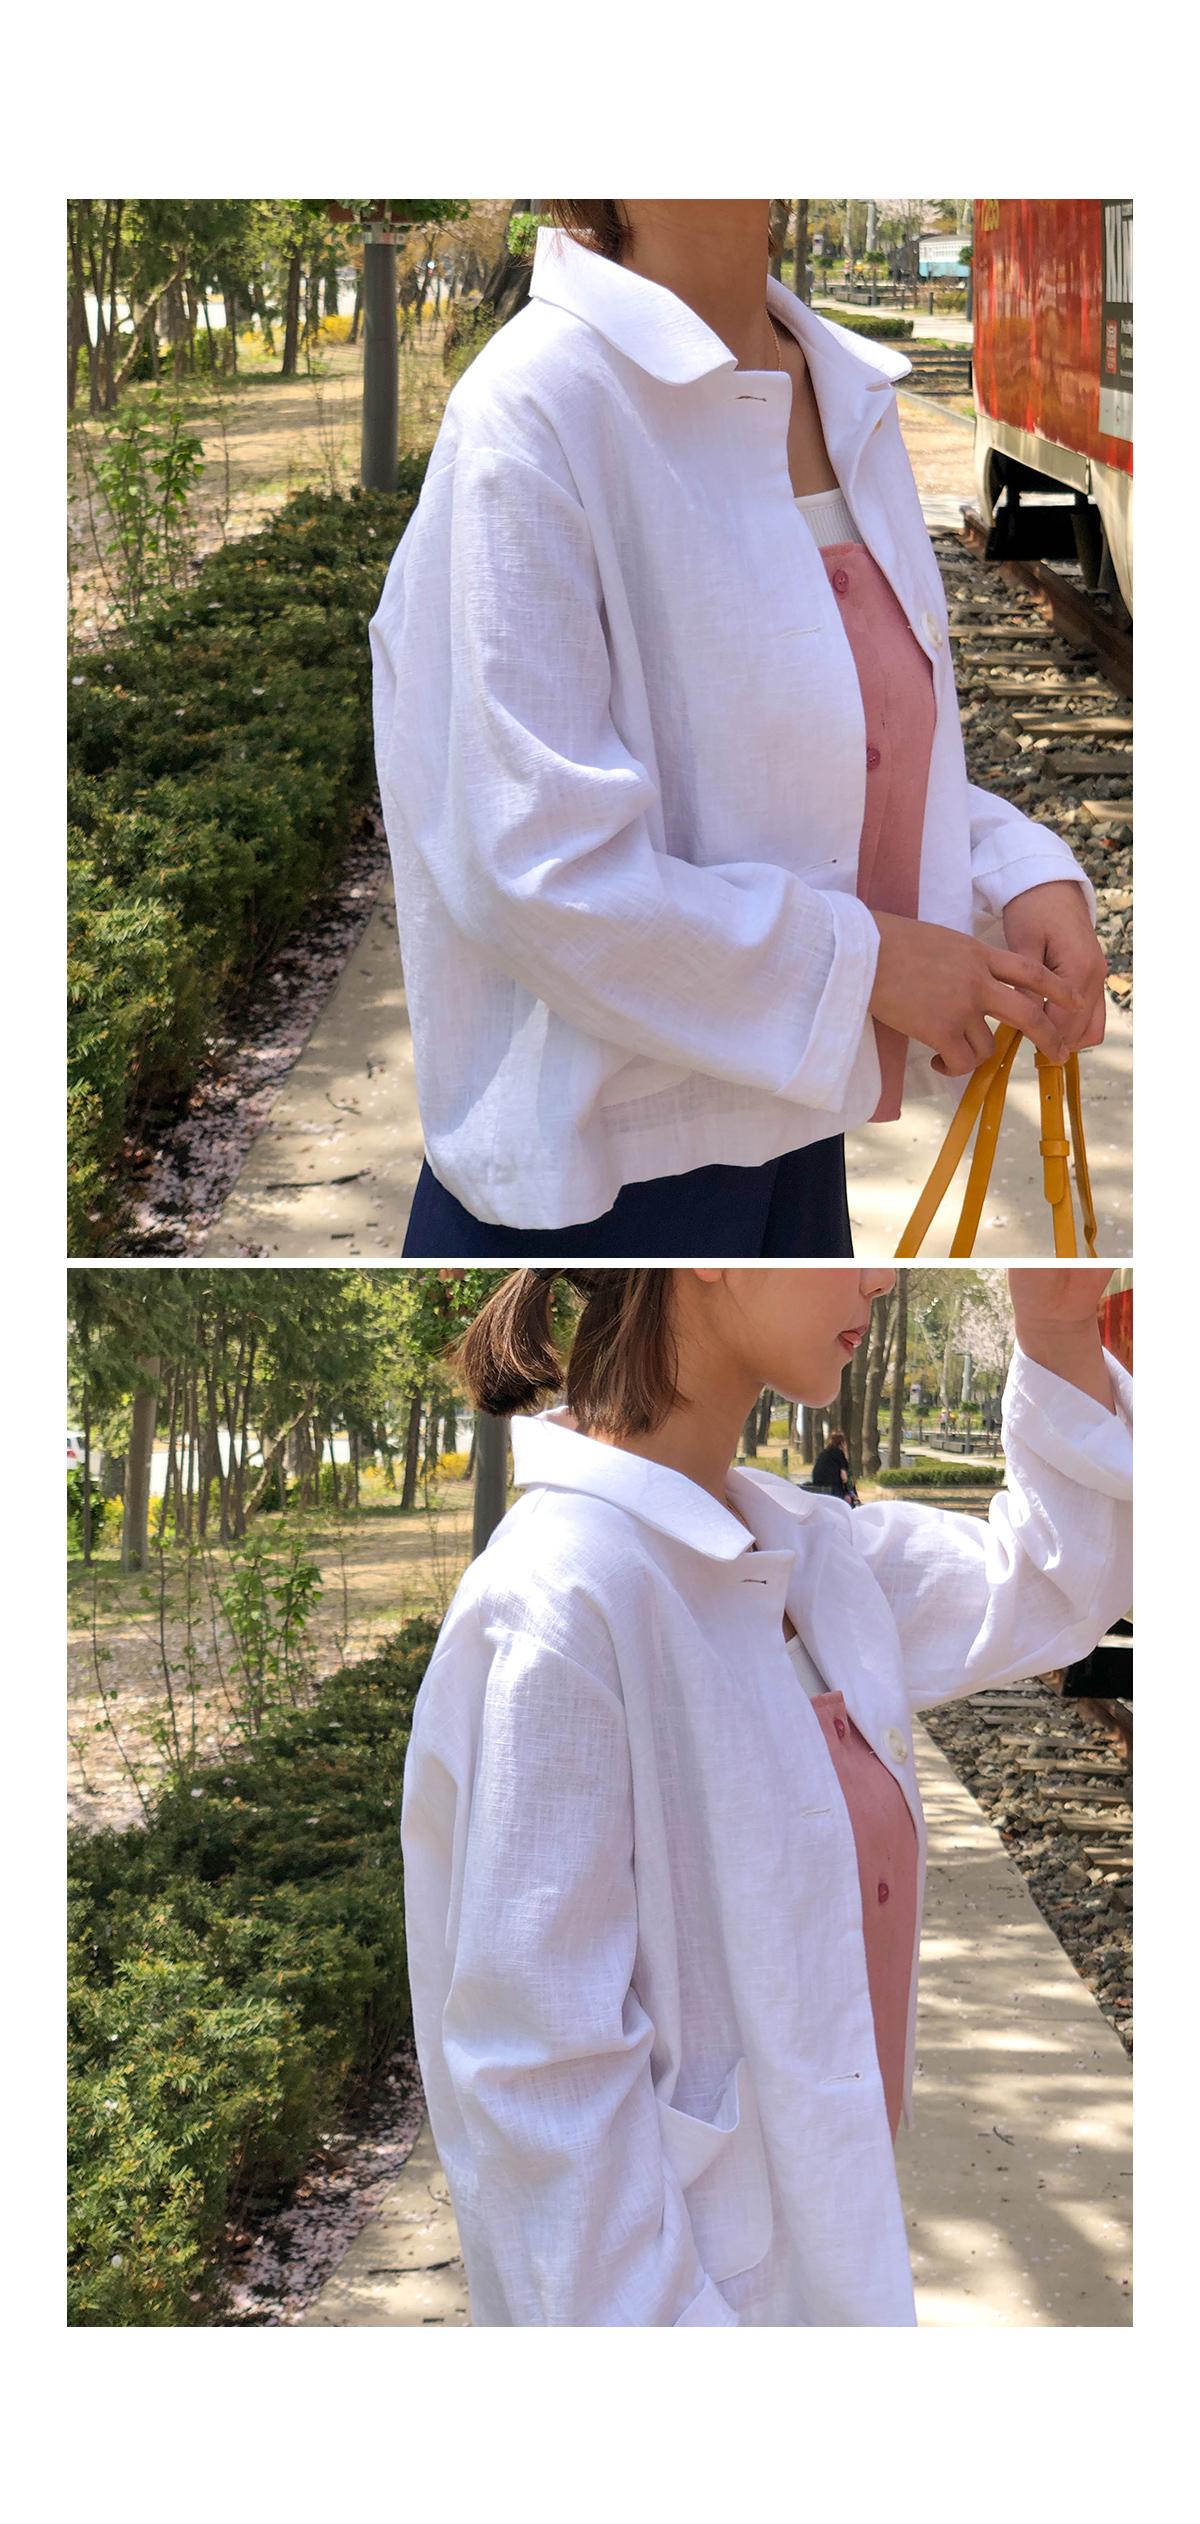 Linen melody bustier & shorts